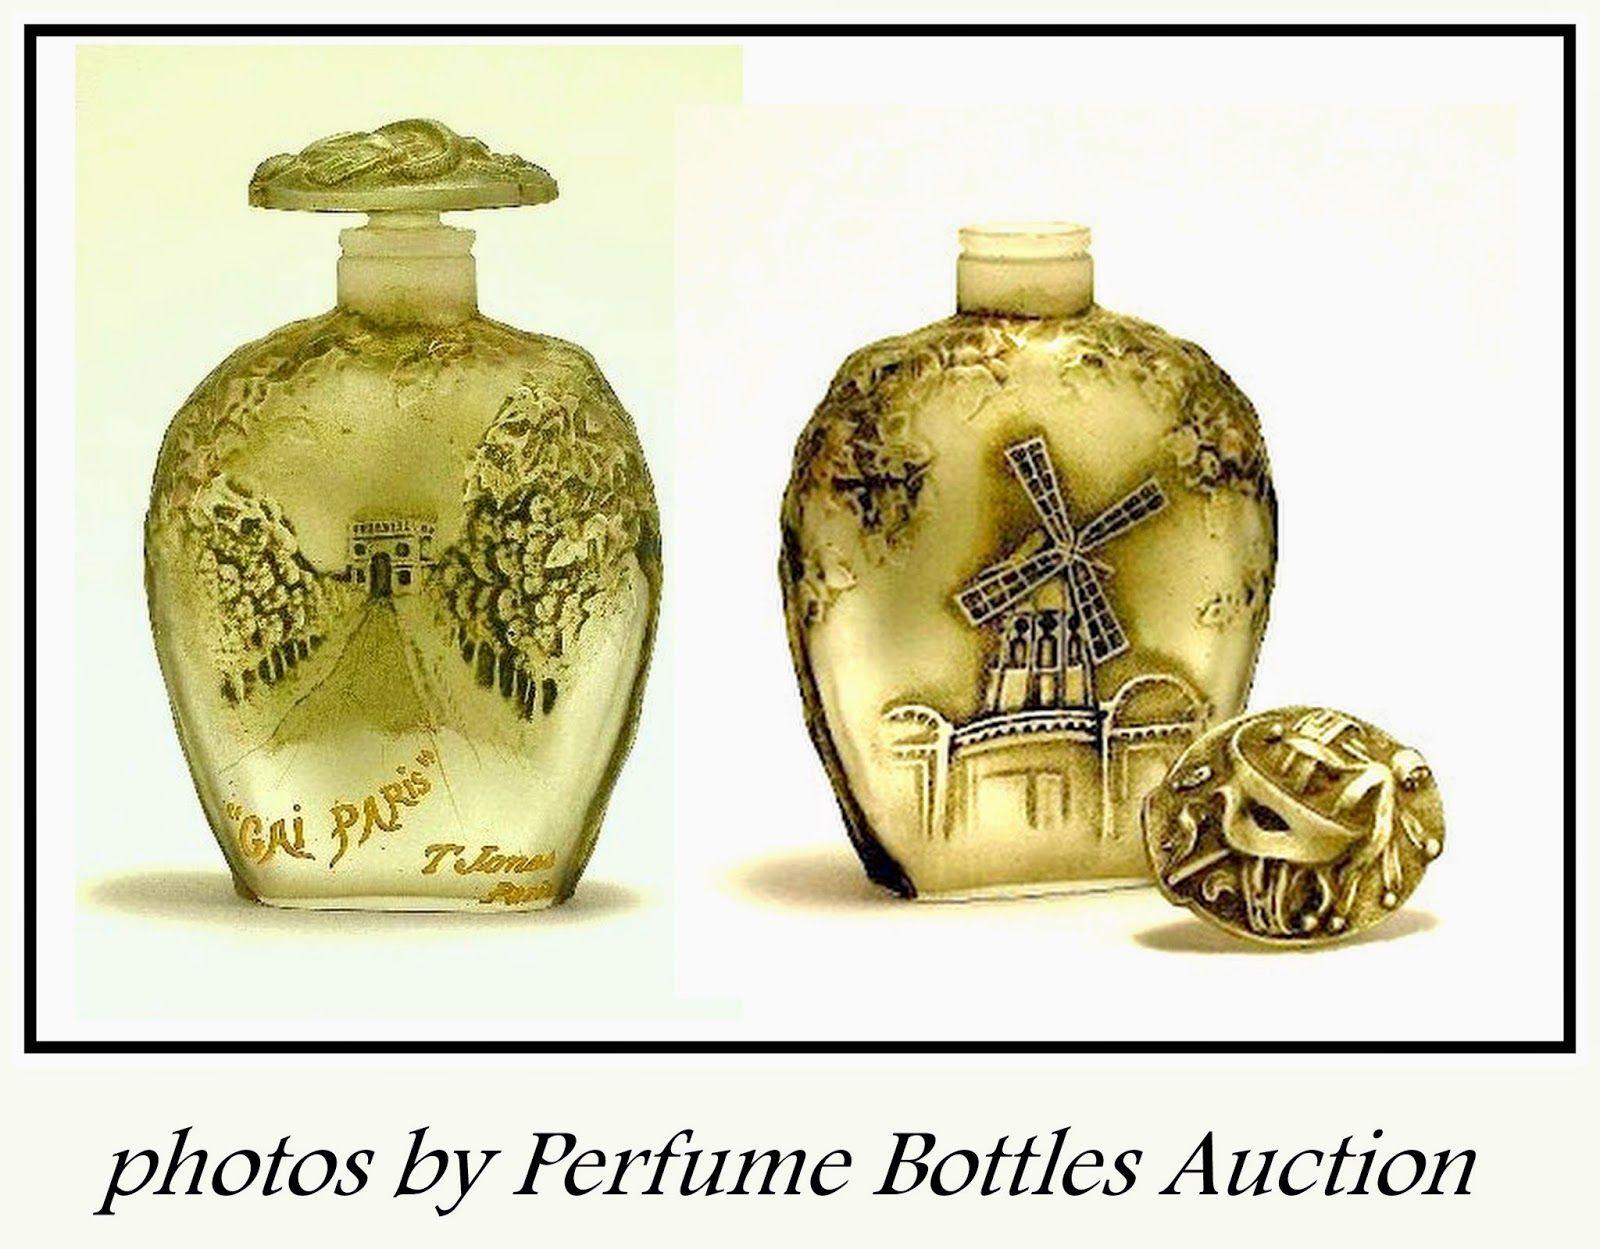 Perfume Name: Gai Paris  Perfume Company: T. Jones  Creation Date: 1912  Bottle Designer: Julien Viard  Bottle Manufacturer:unknown  Mea...